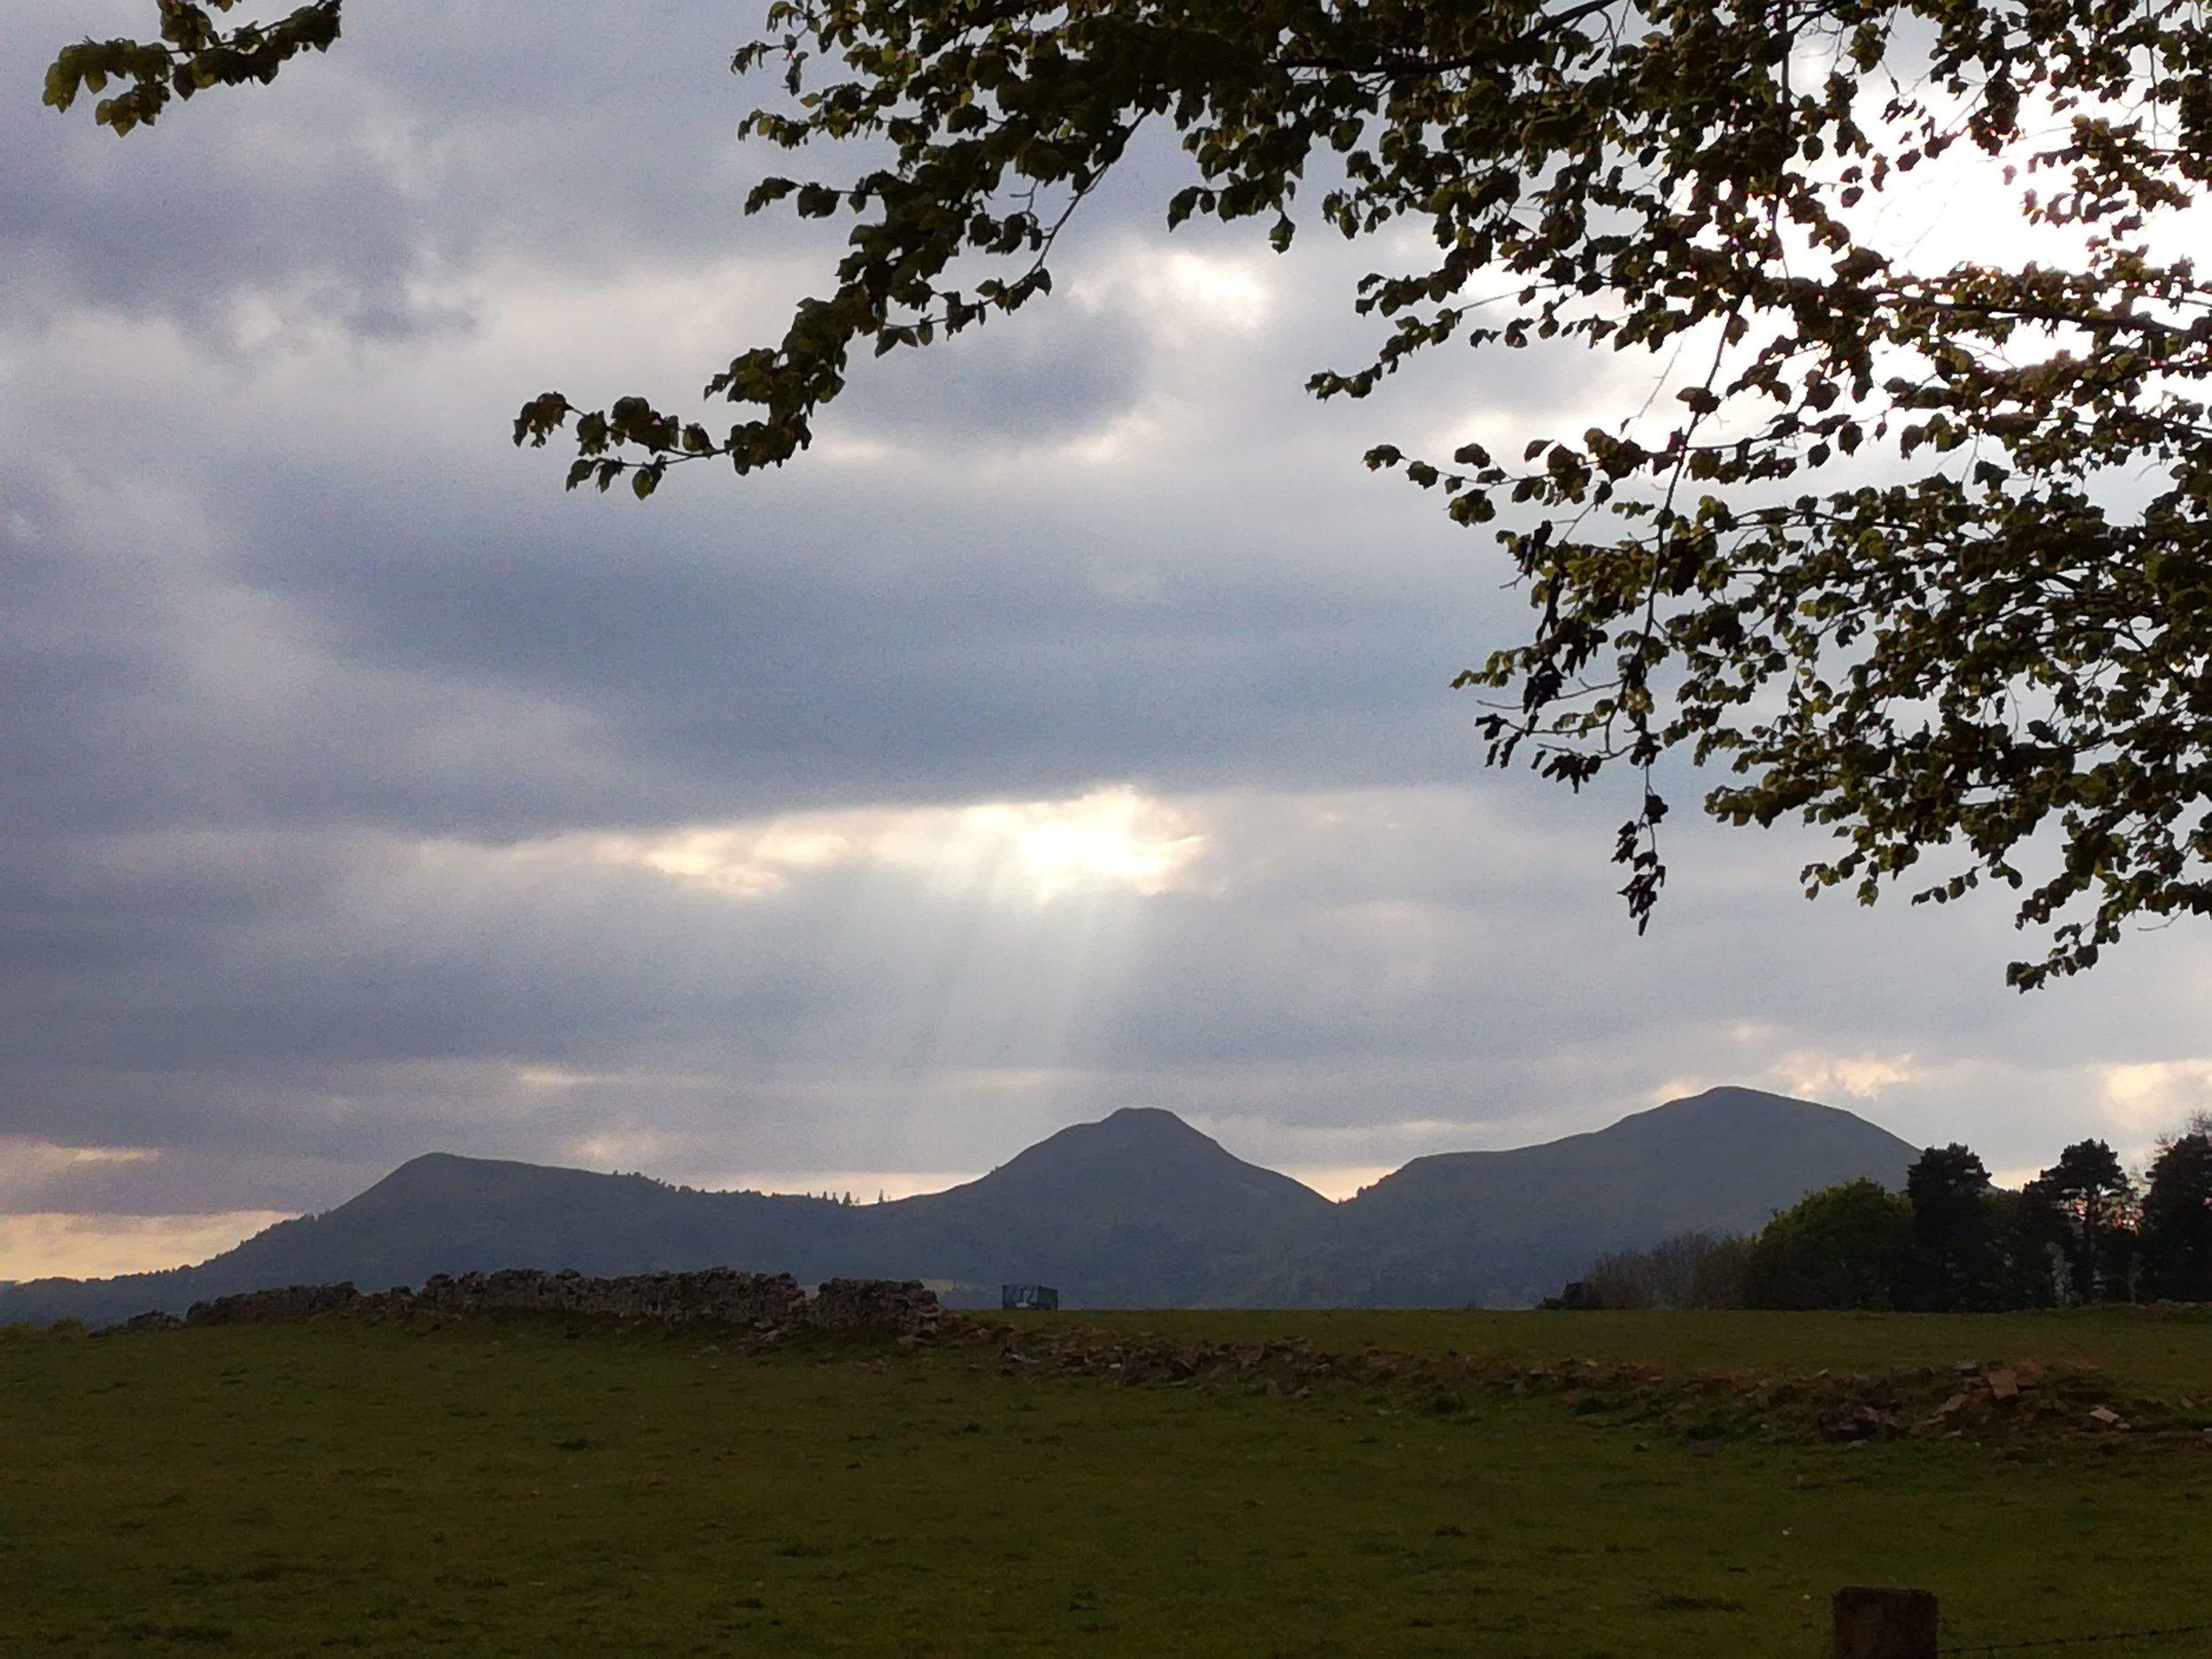 Eildon Hills, Tour & Walk Scotland in small group adventures - Roaming Scotland. jpg